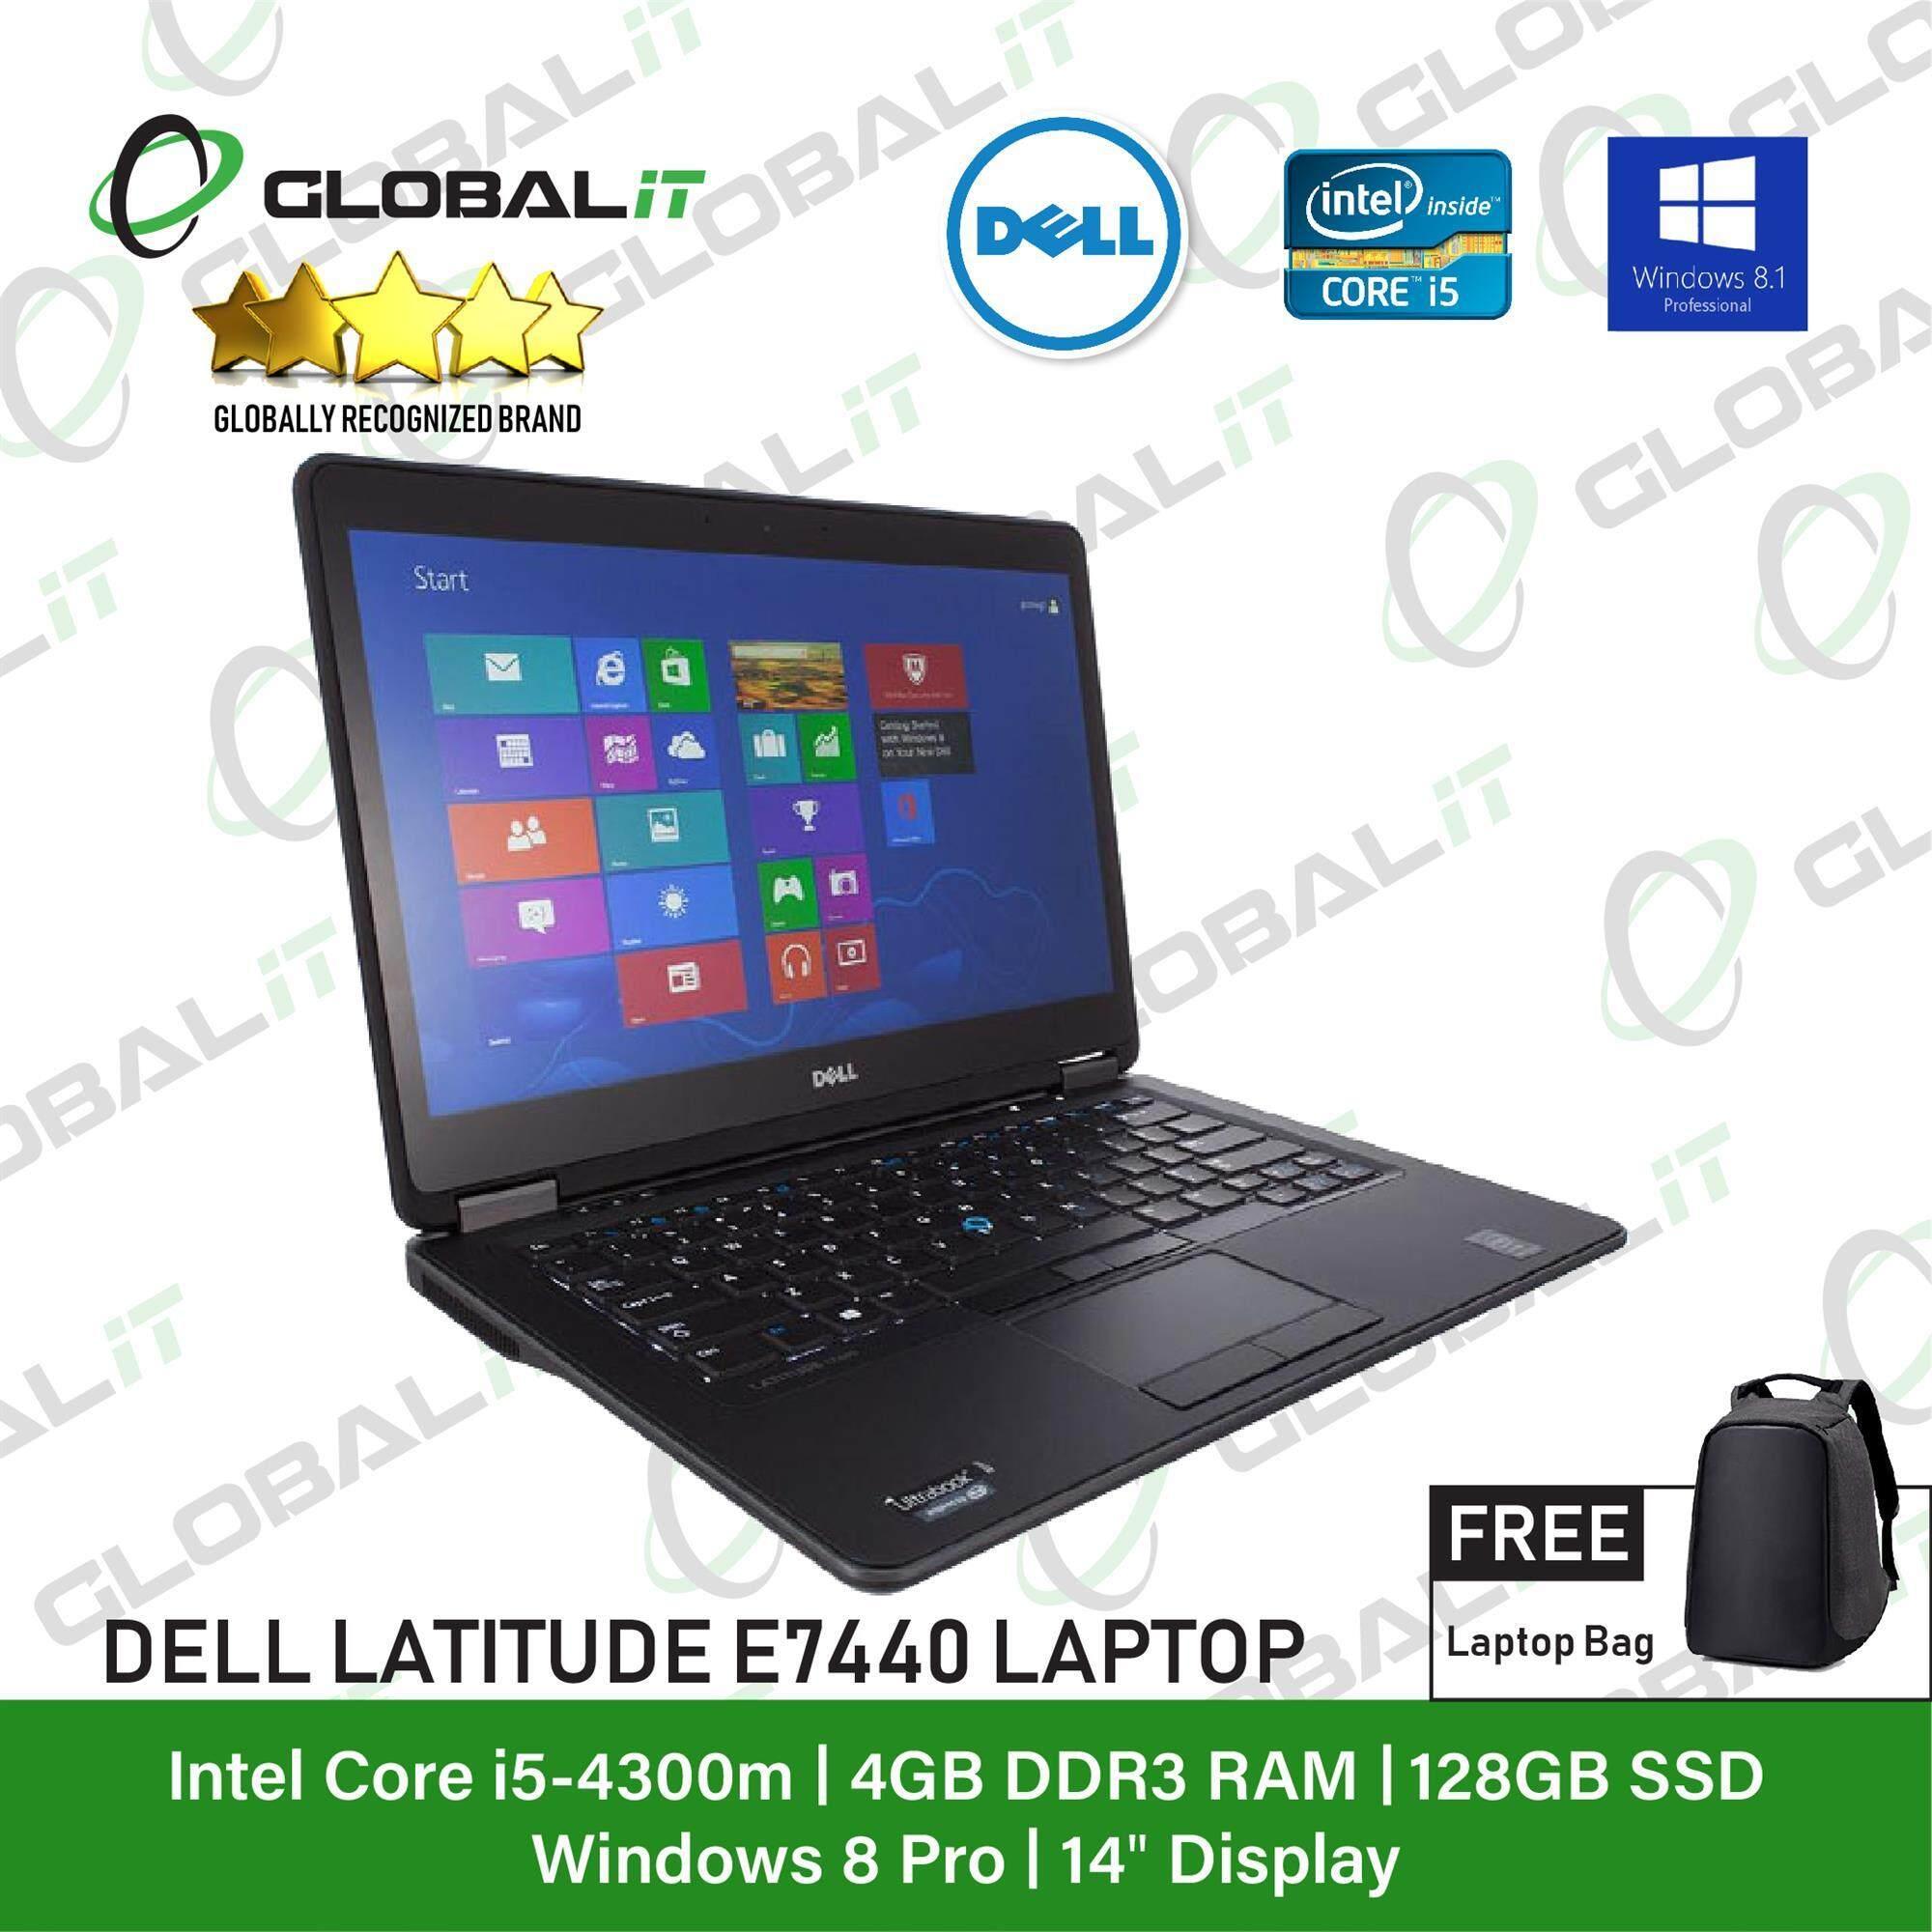 (Refurbished Notebook) Dell Latitude E7440 Laptop / 14 inch LCD / Intel Core i5-4300M / 4GB DDR3 Ram / 128GB SSD / WiFi / Windows 8 Pro Malaysia